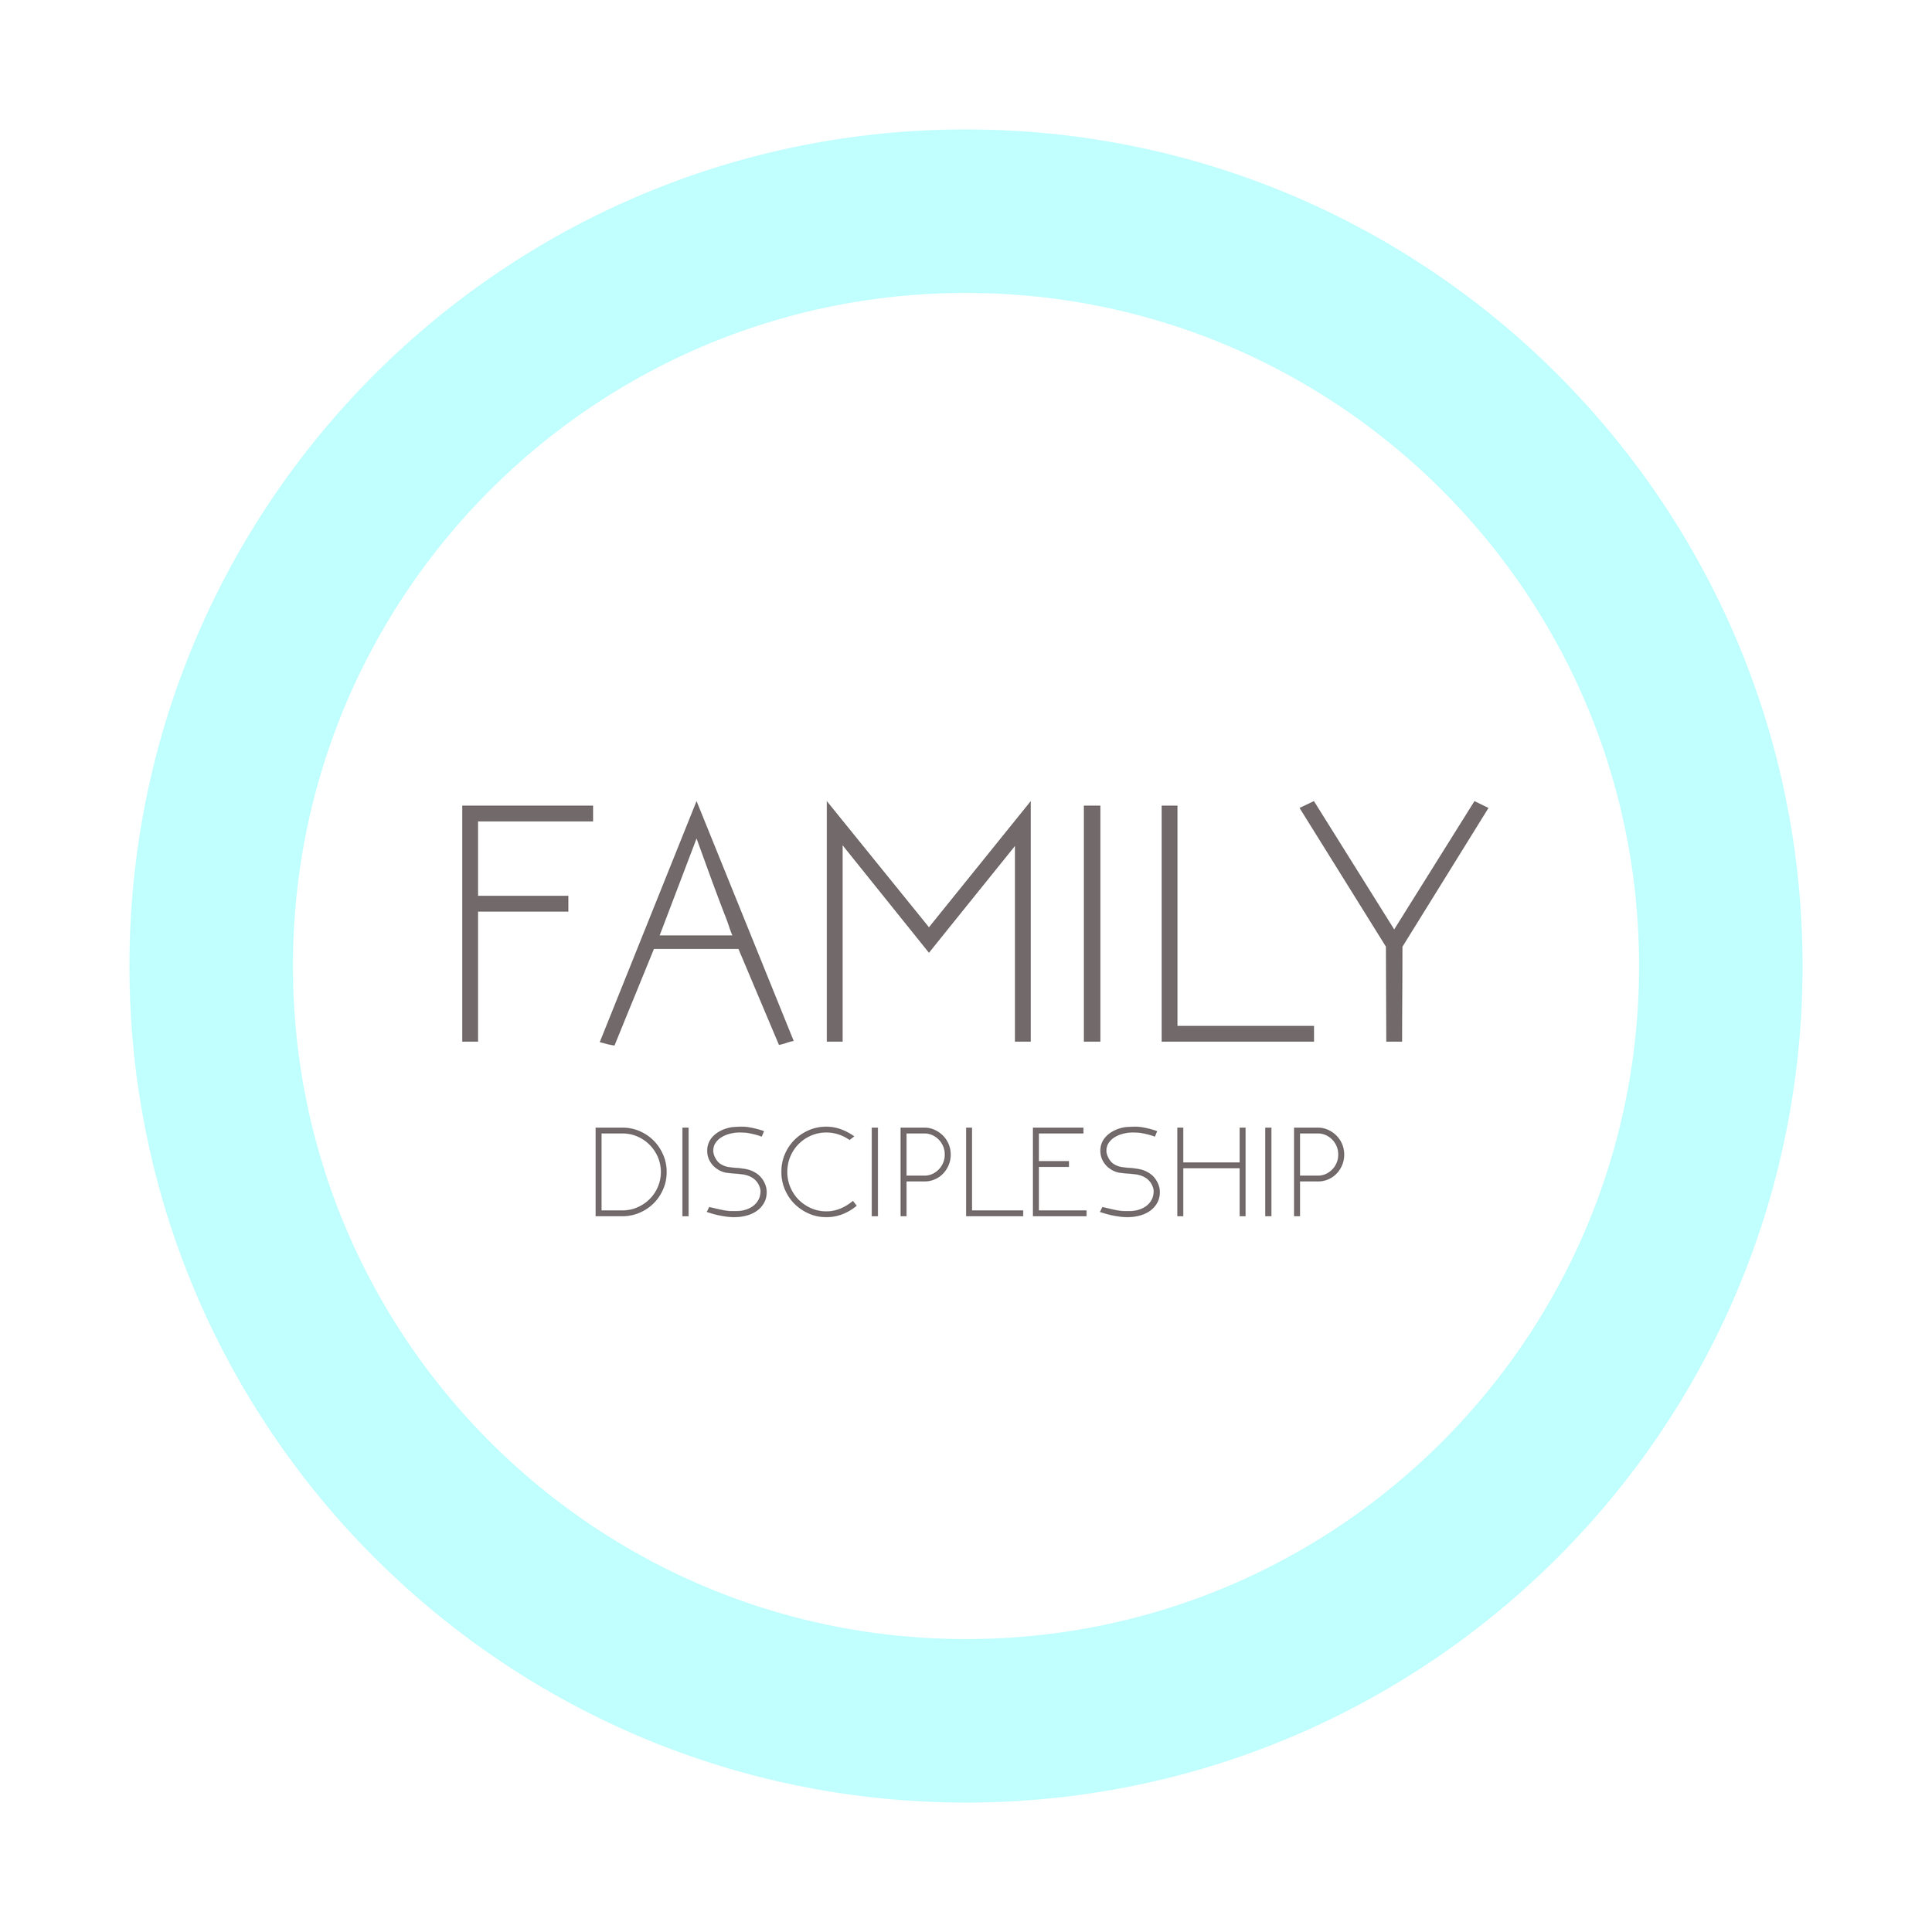 Family discipleship - sermon graphic .jpg